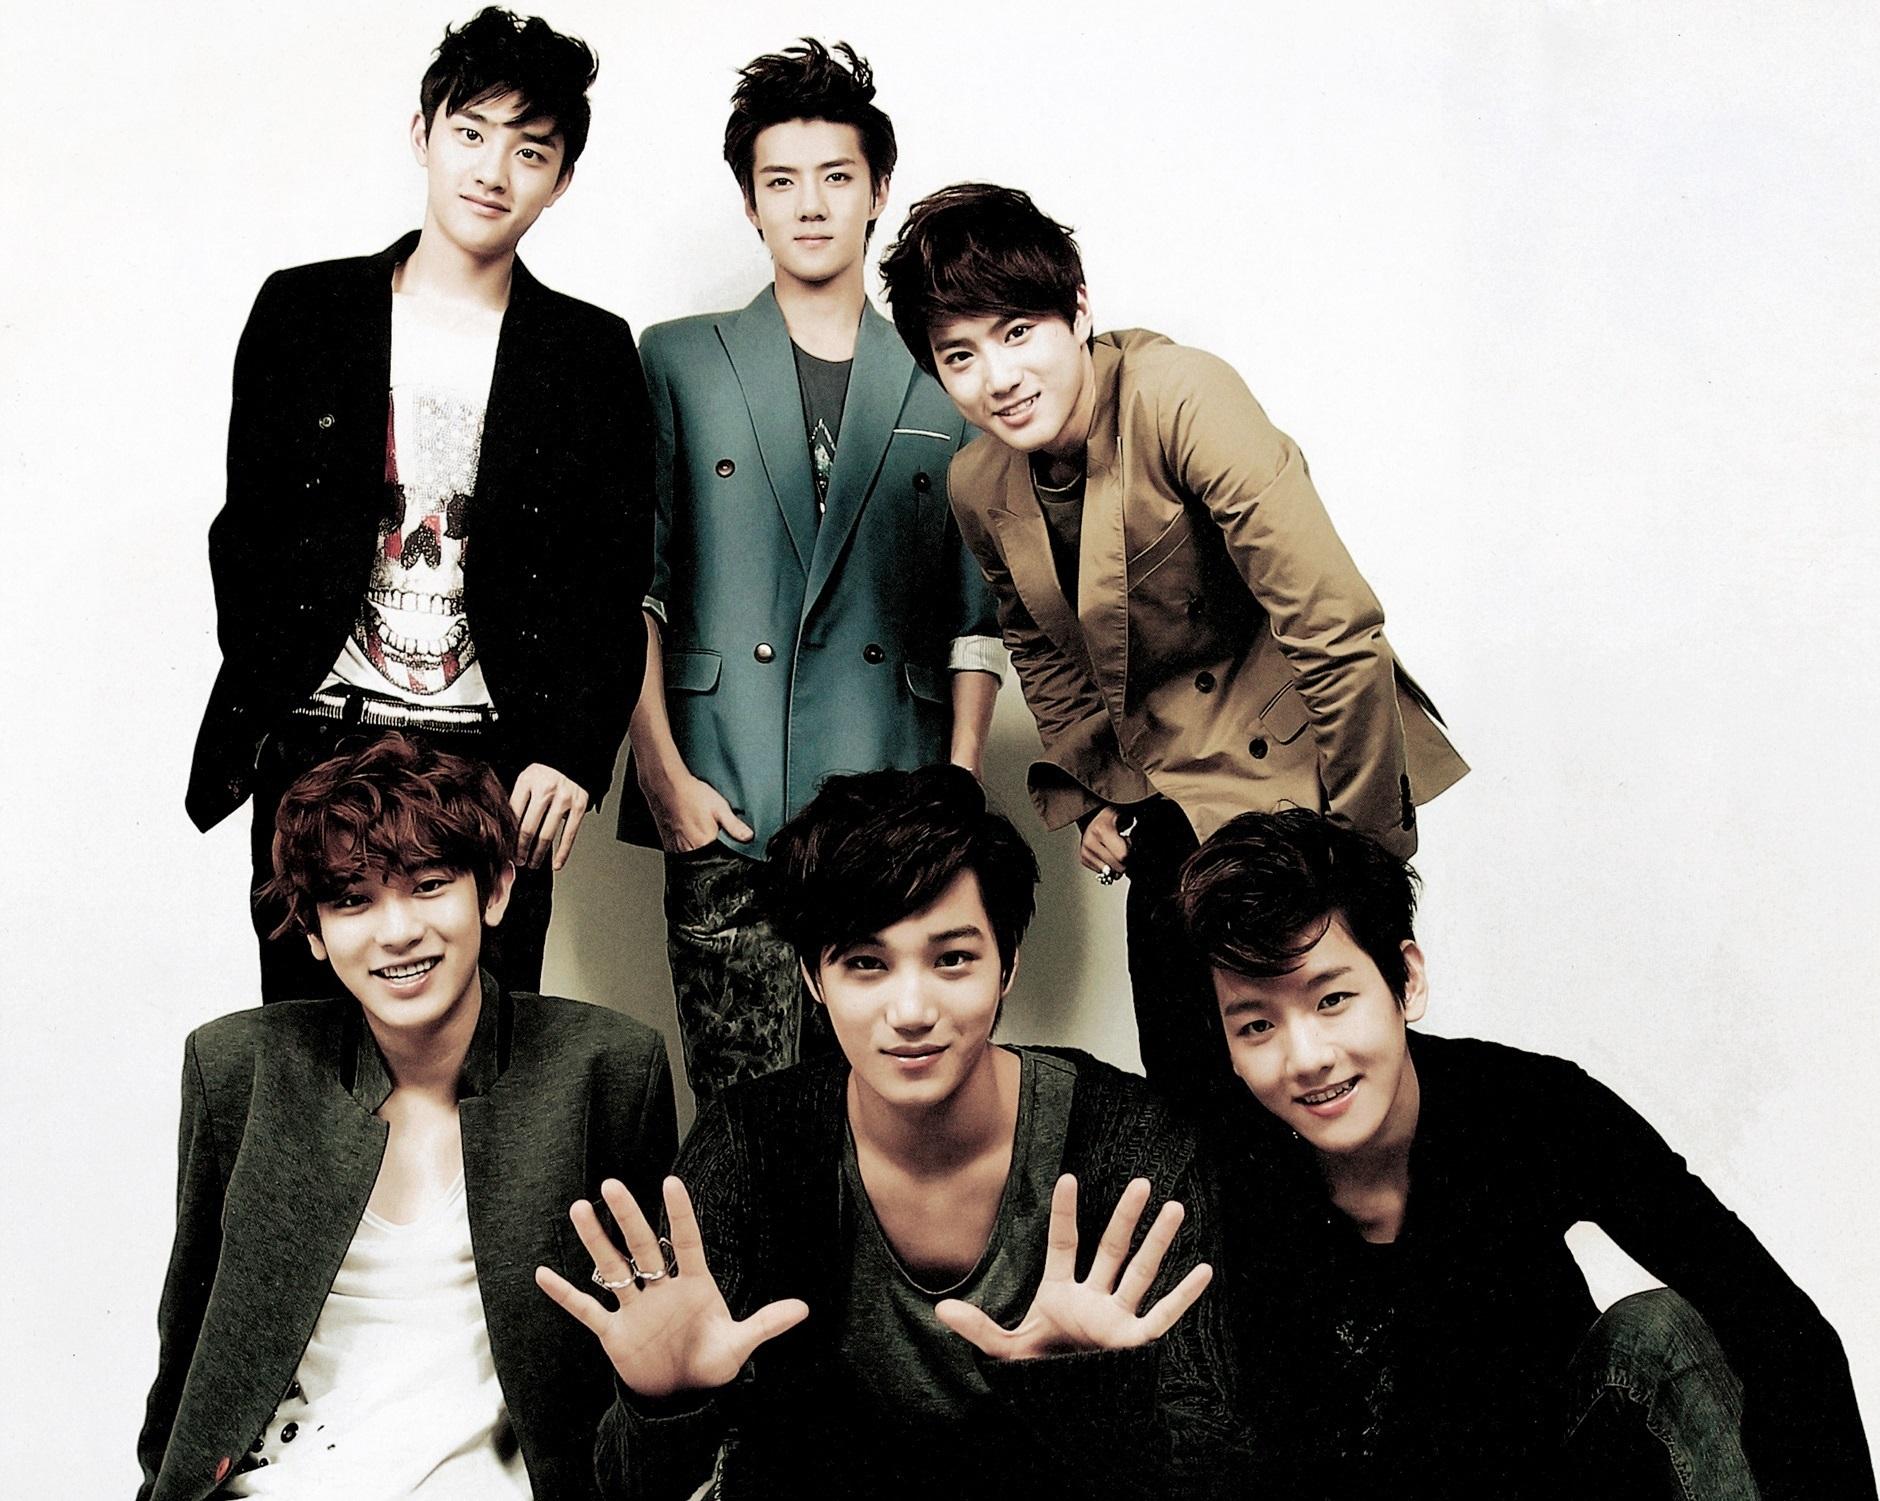 Kpop Boy Band which kpop boys ...